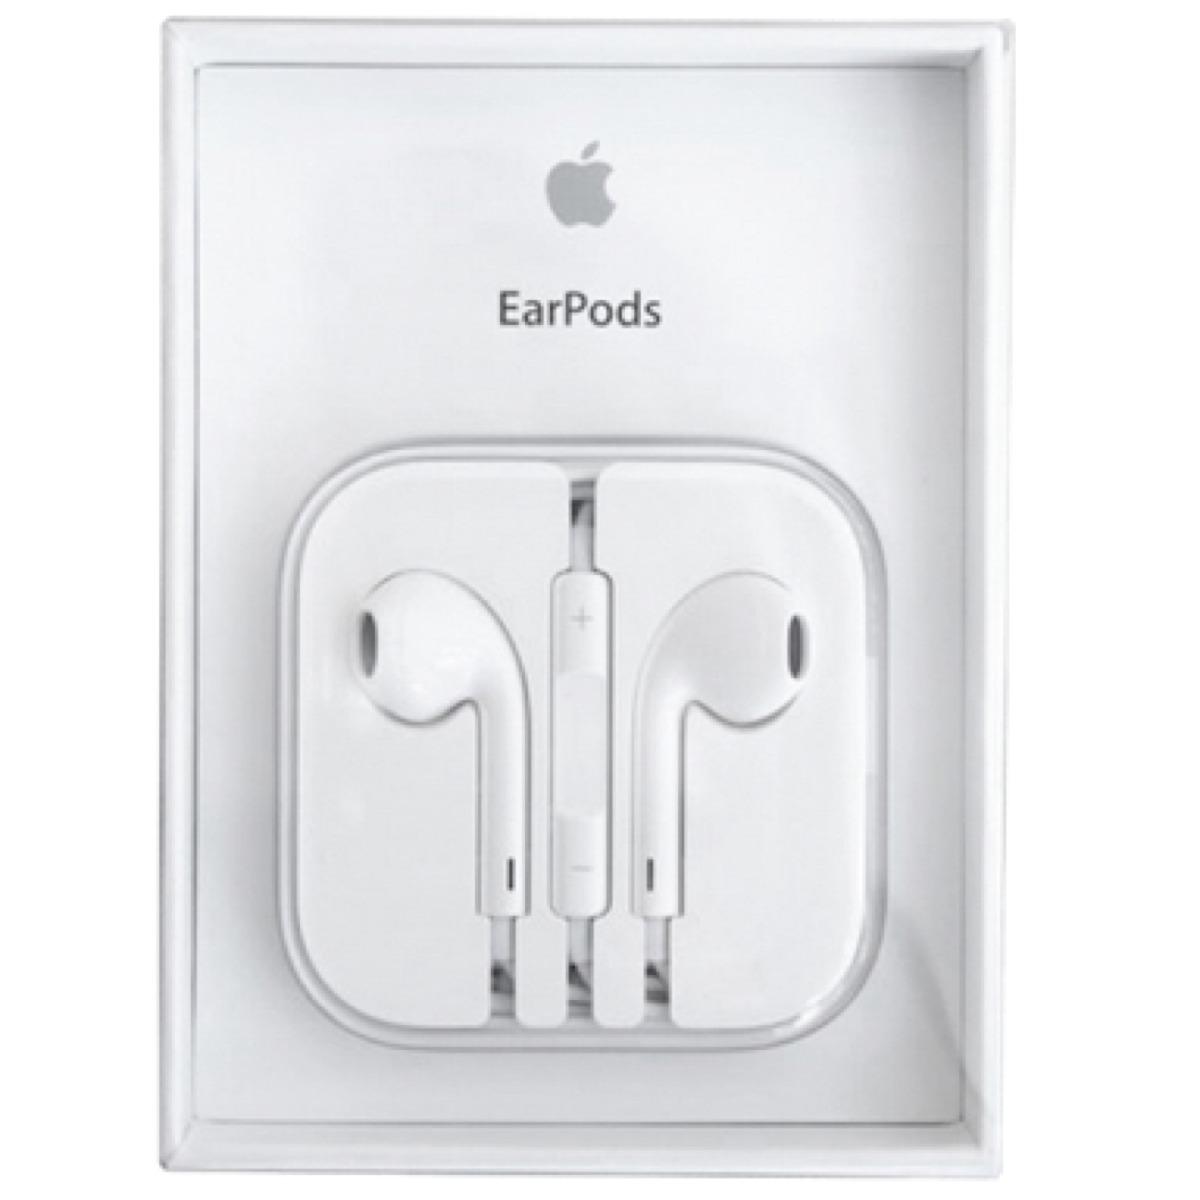 Earpods Originales Apple Iphone 6 6s Y 5se 349 00 En